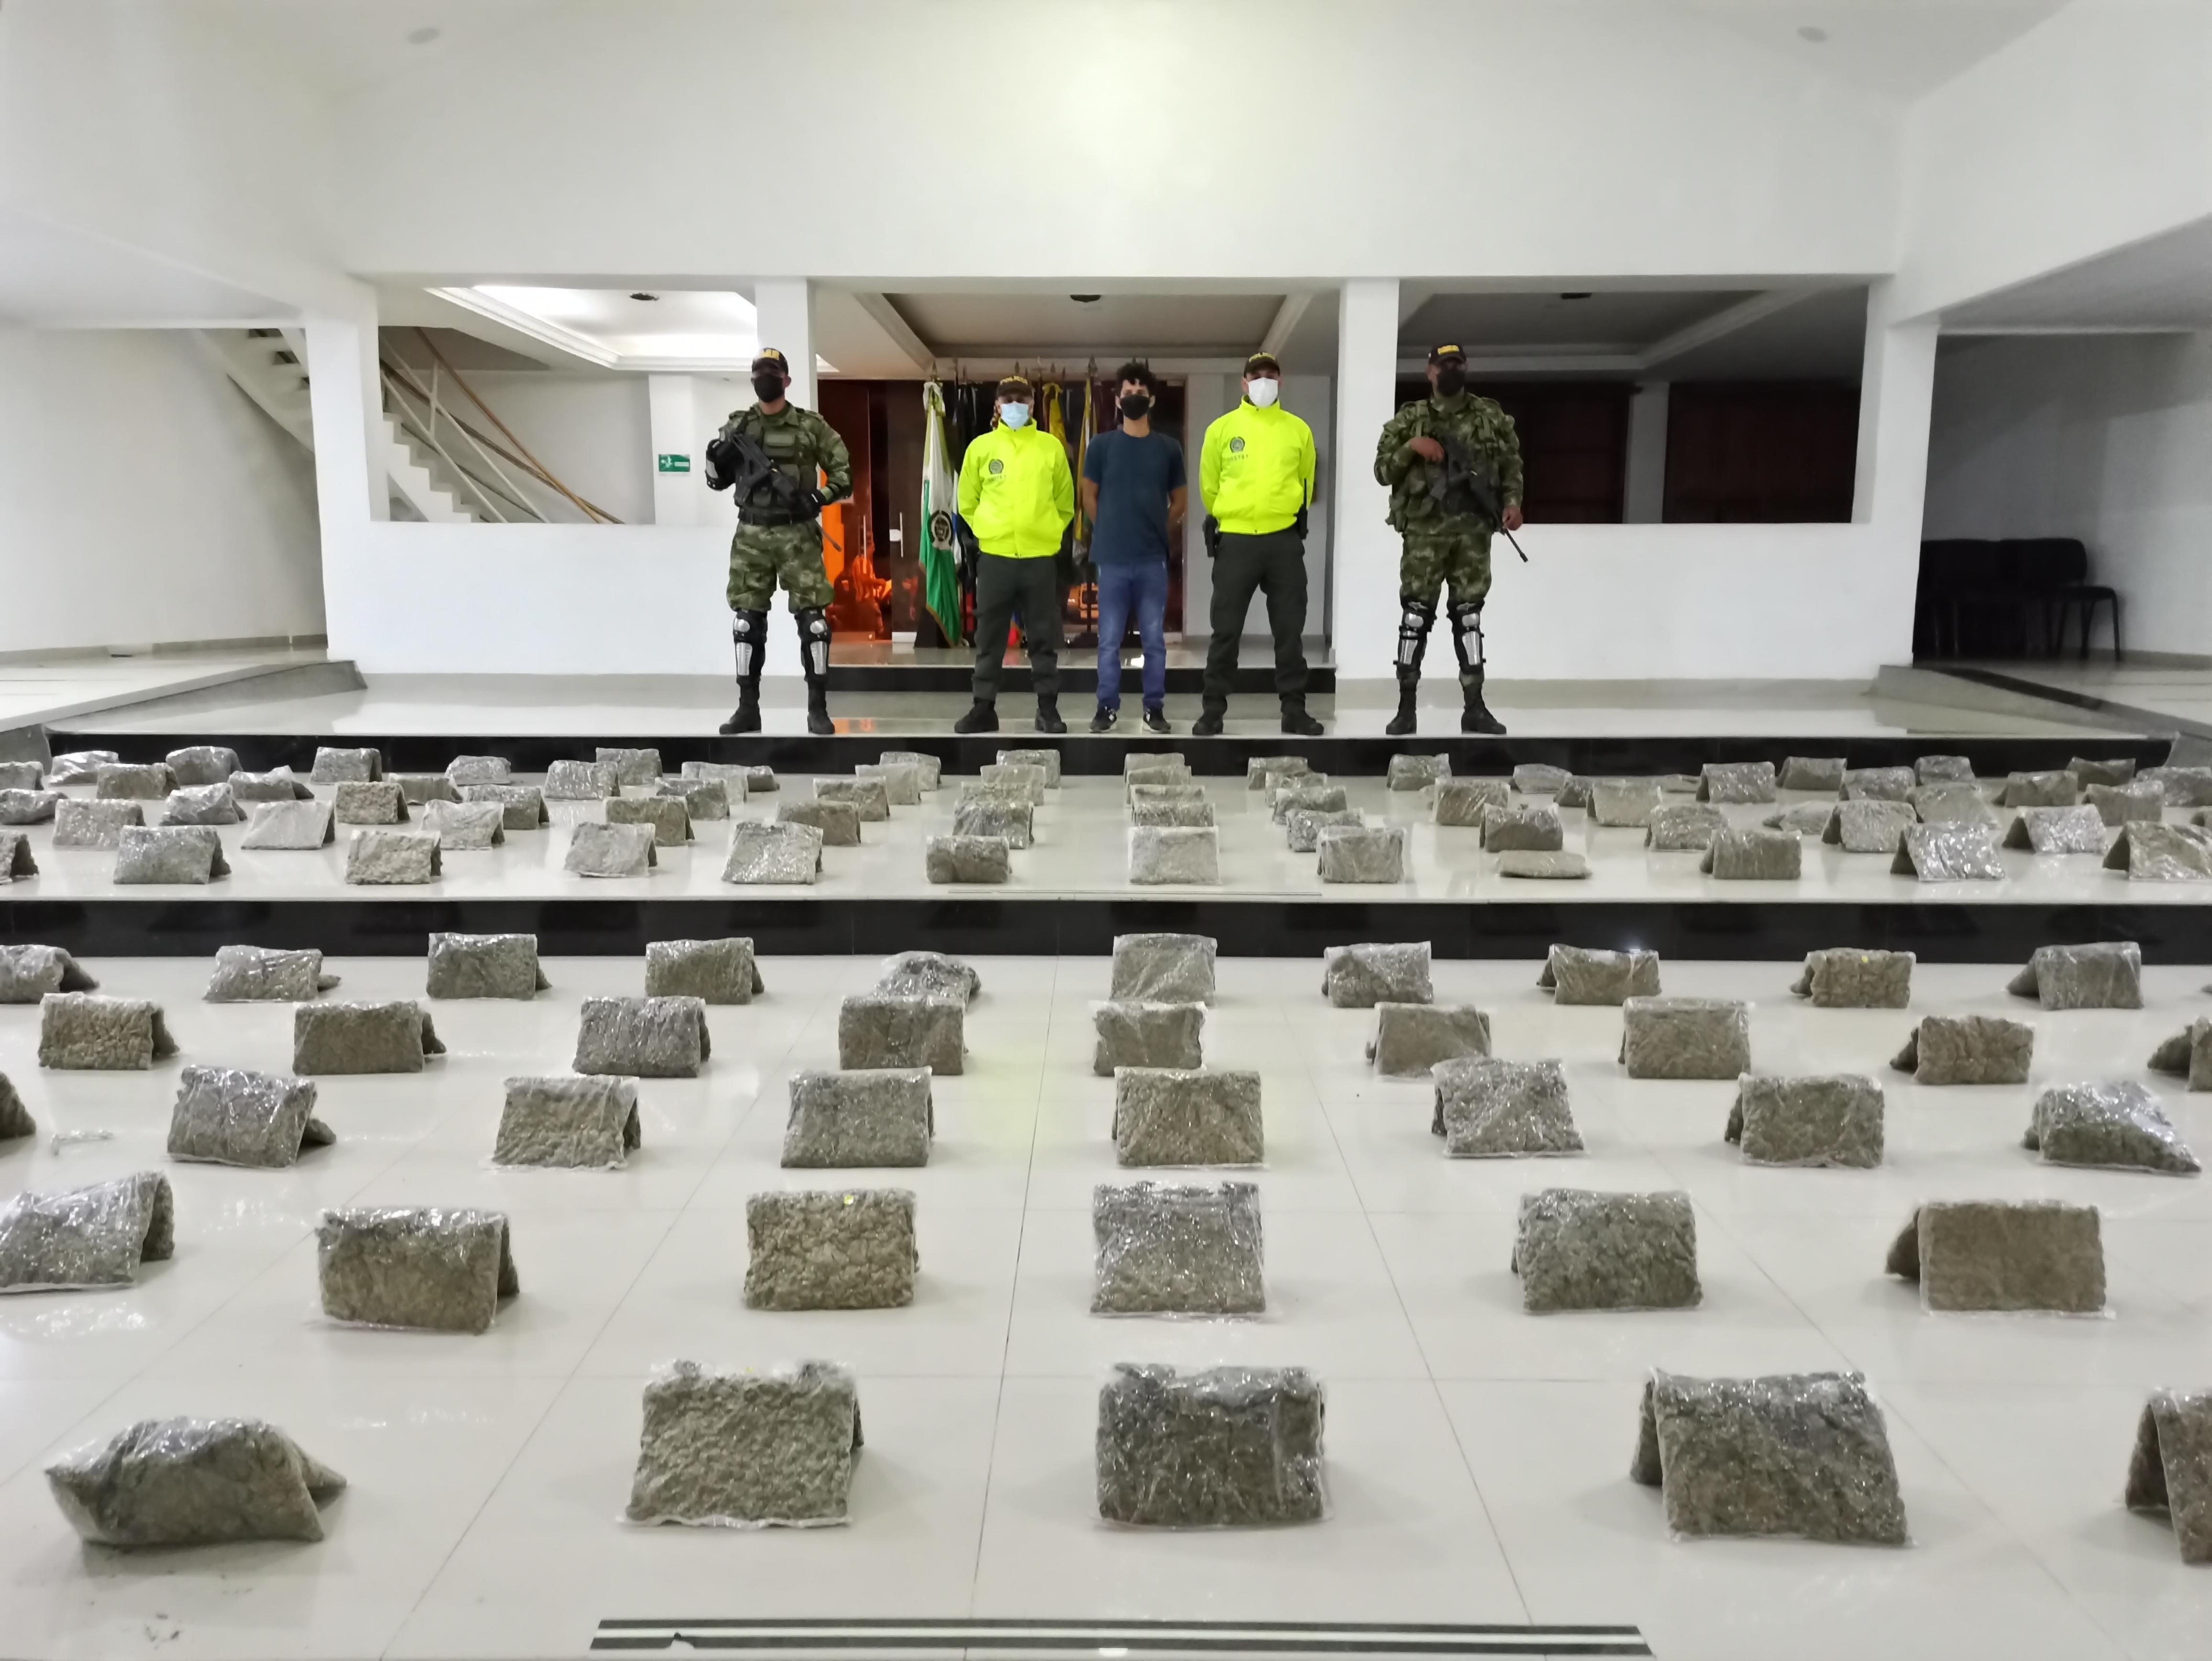 hoyennoticia.com, Lo pillaron con 129 kilos de marihuana